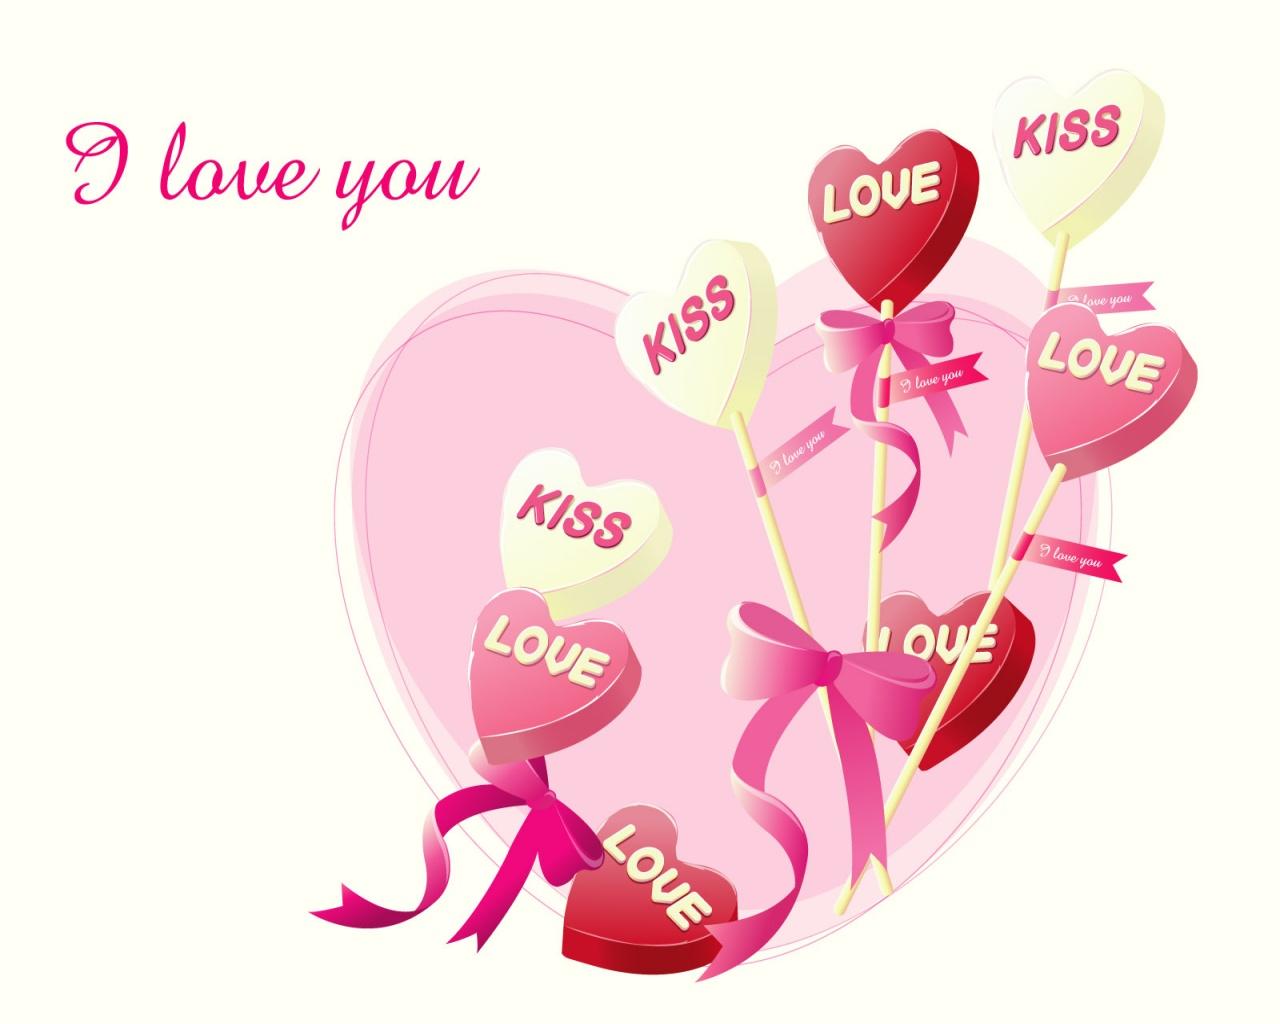 i_love_you11